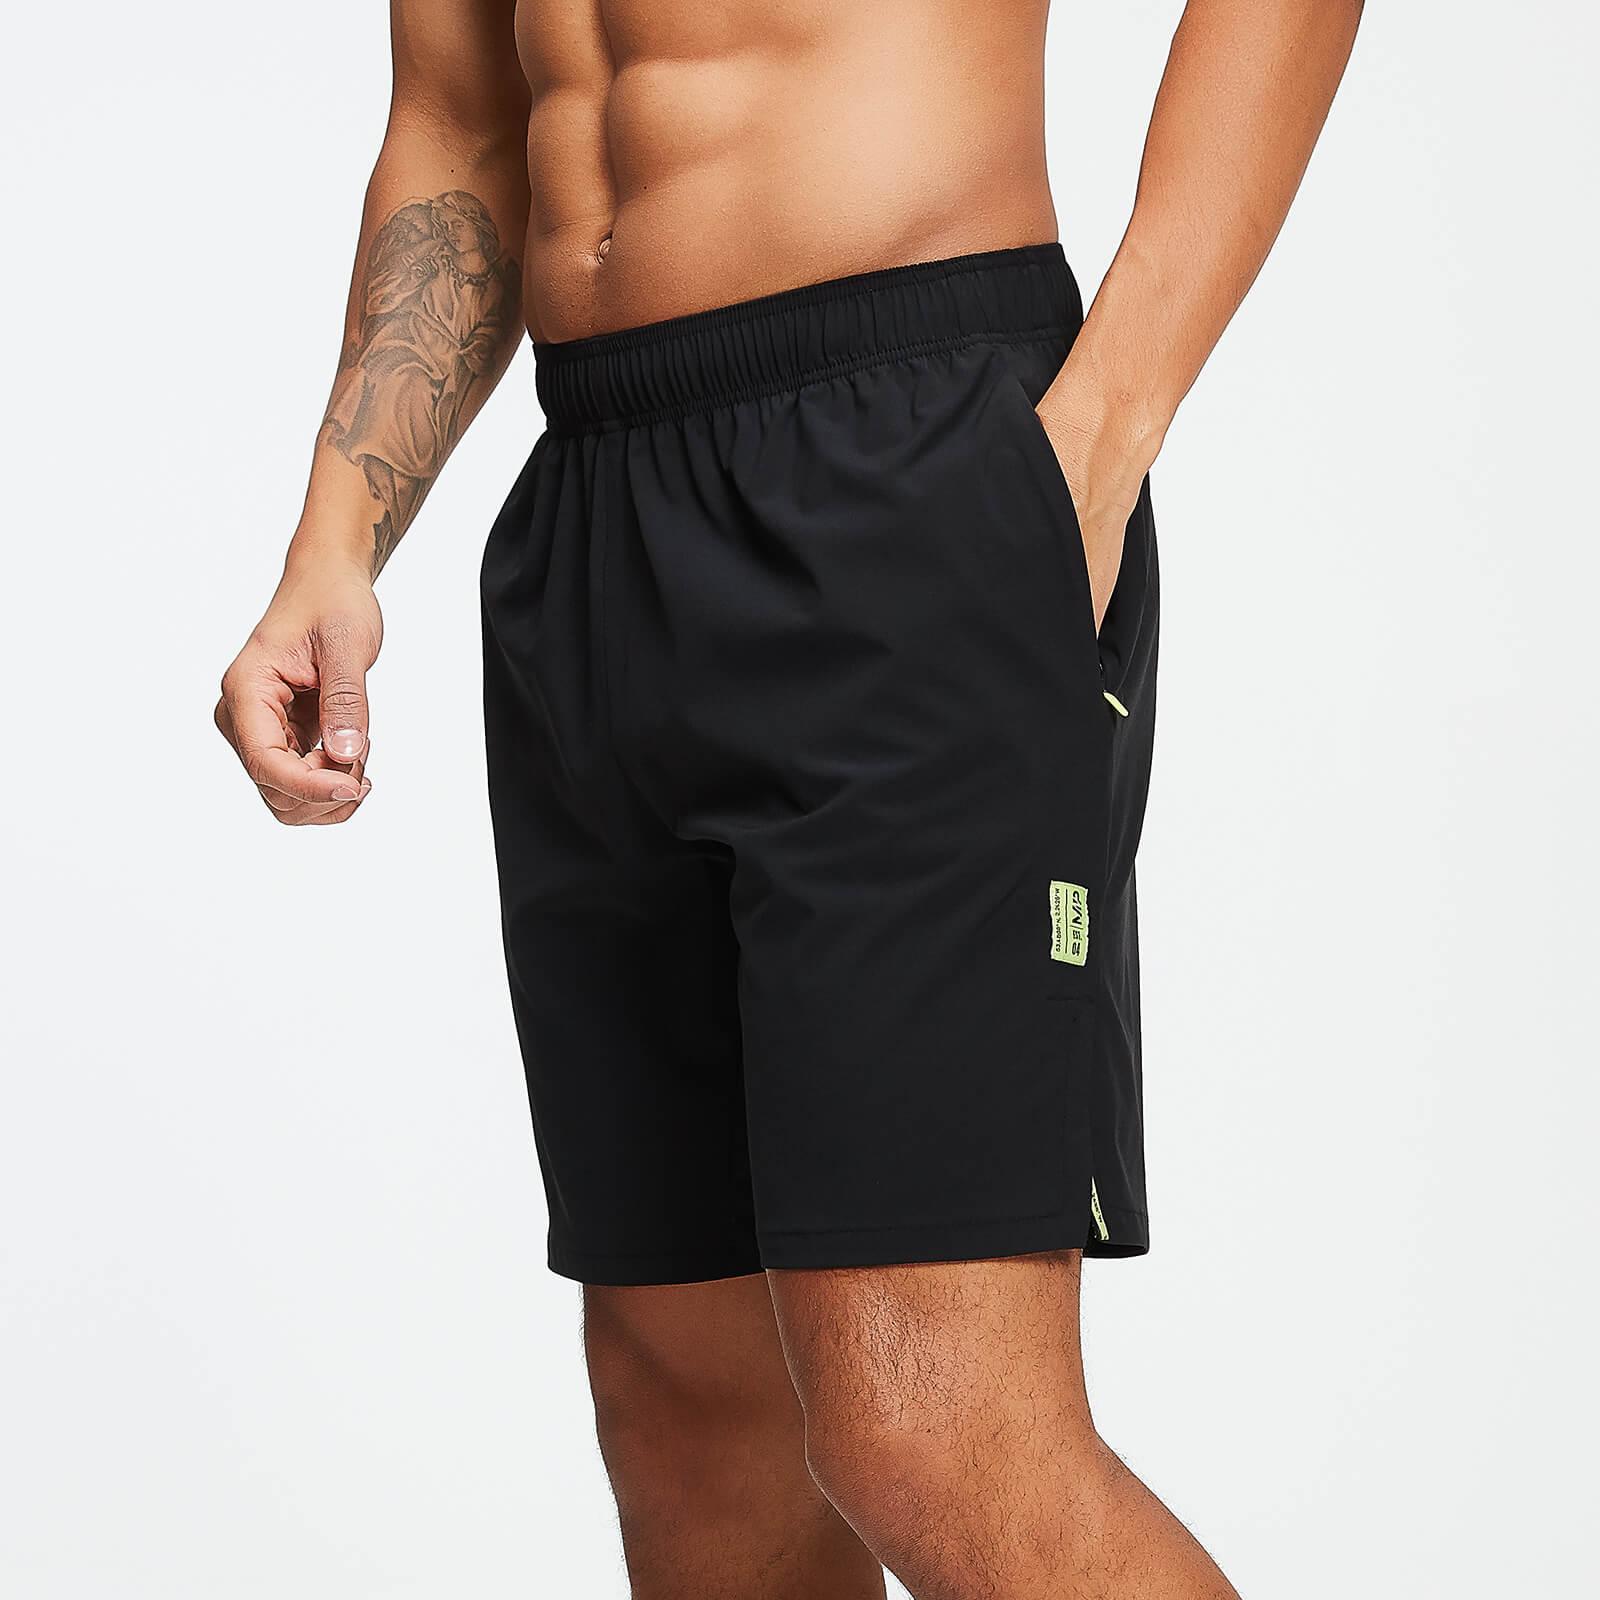 Myprotein MP Training Men's Stretch Woven 9 Inch Shorts - Black - M